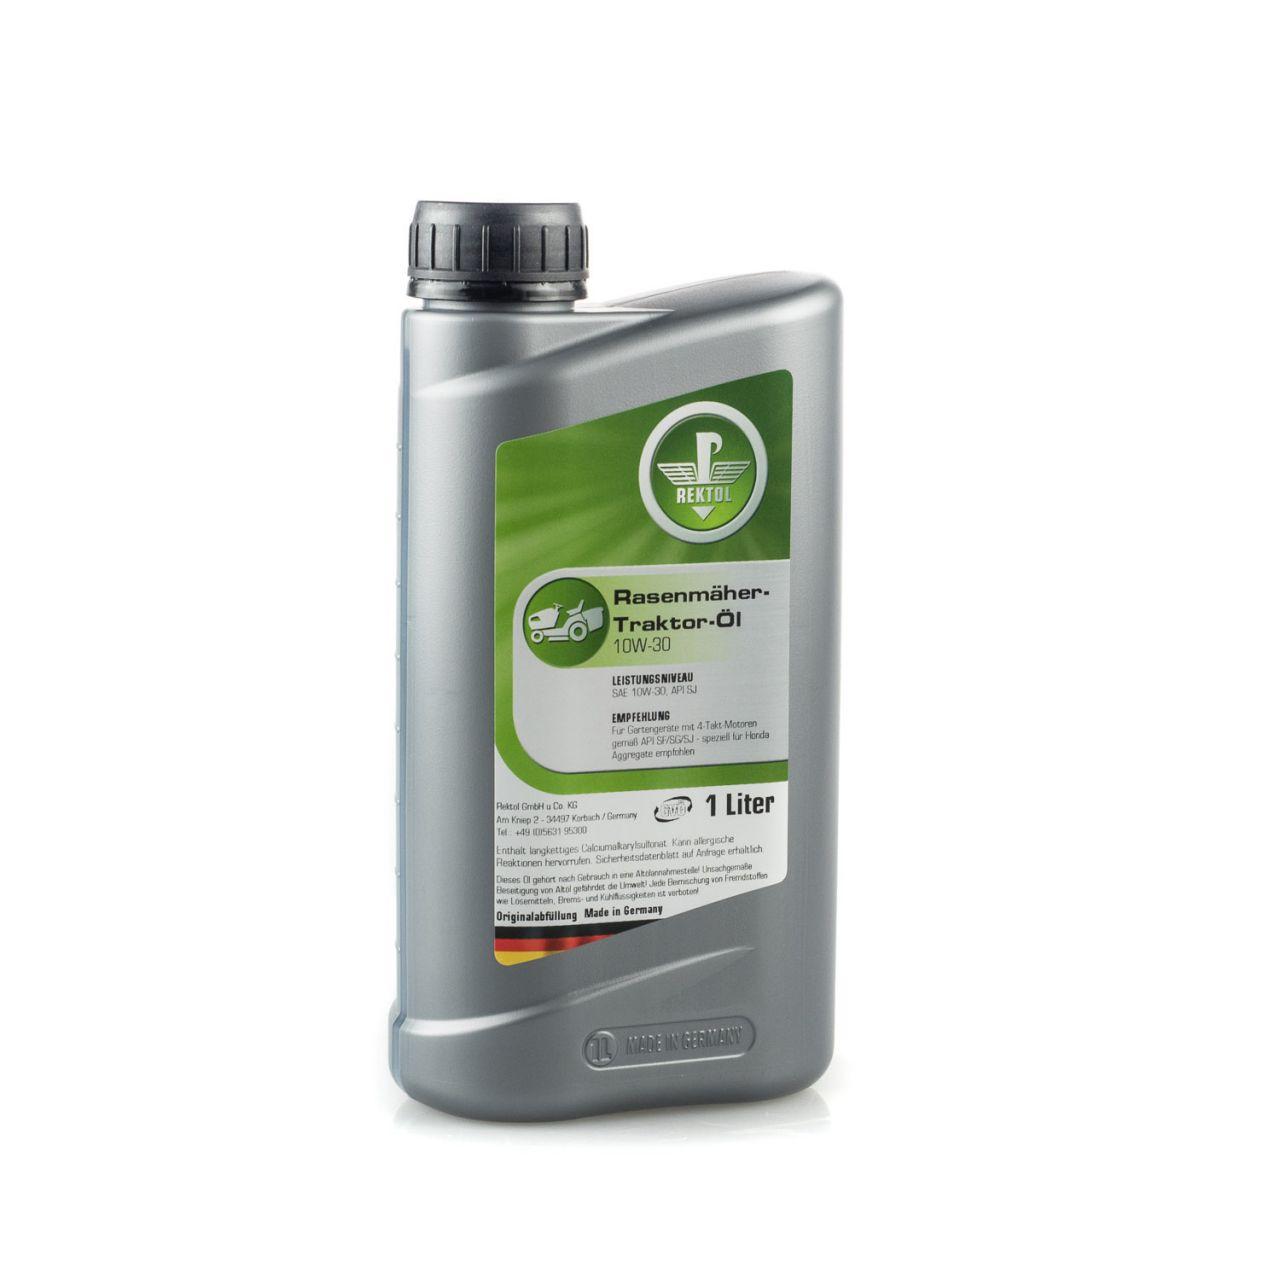 Rektol Rasenmäher & Rasentraktor Öl 10W30 (1 Liter) RK_001